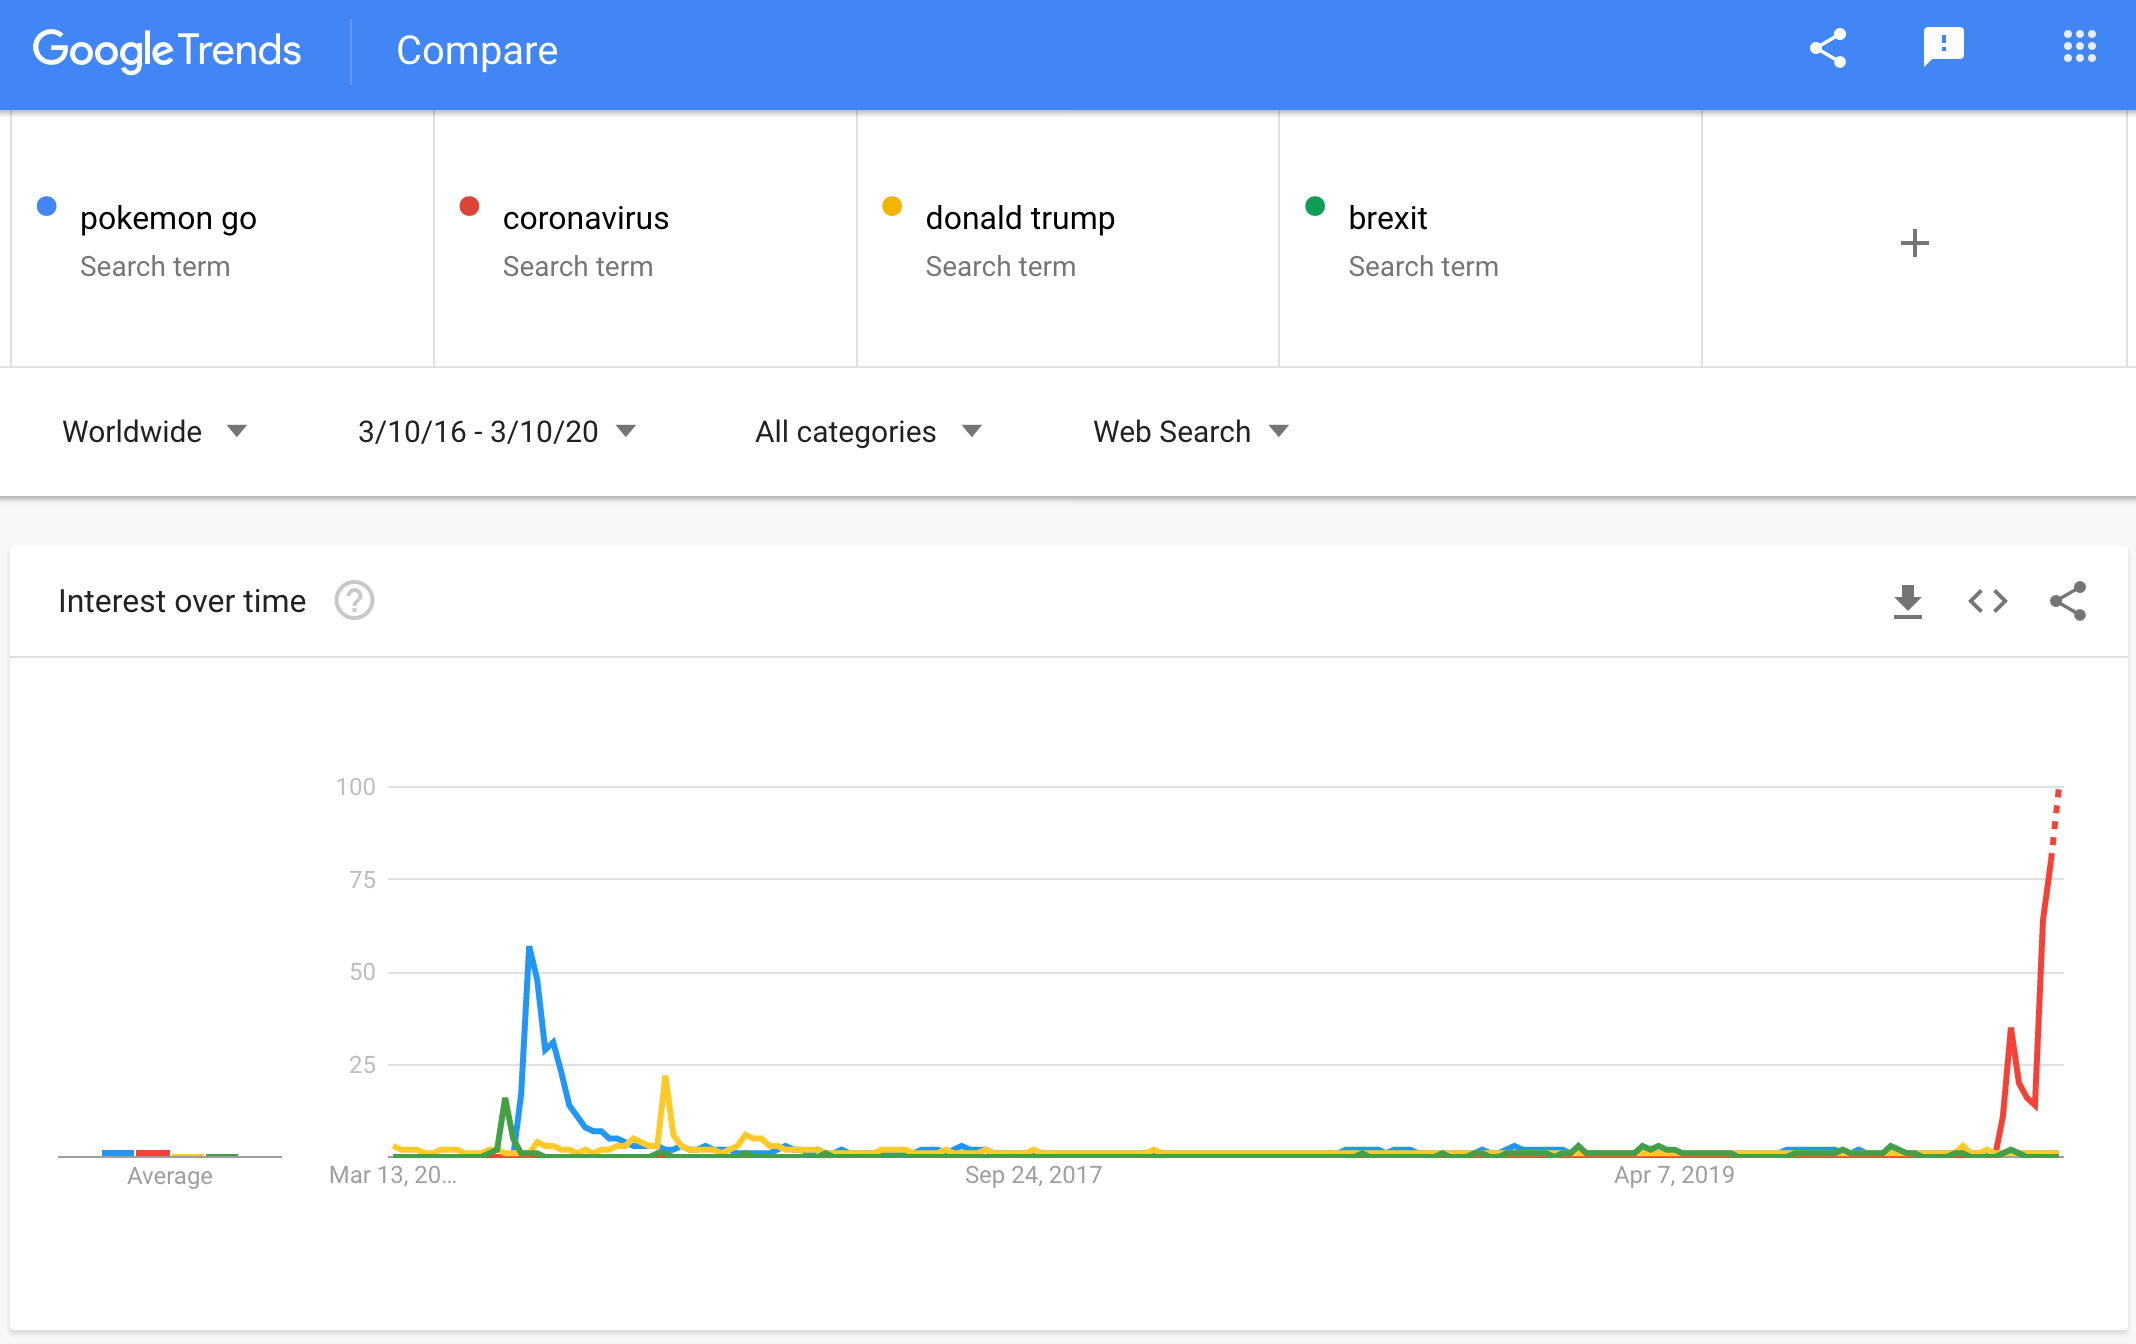 Google Trends comparison between pokemon go, coronavirus,donald trump and brexit